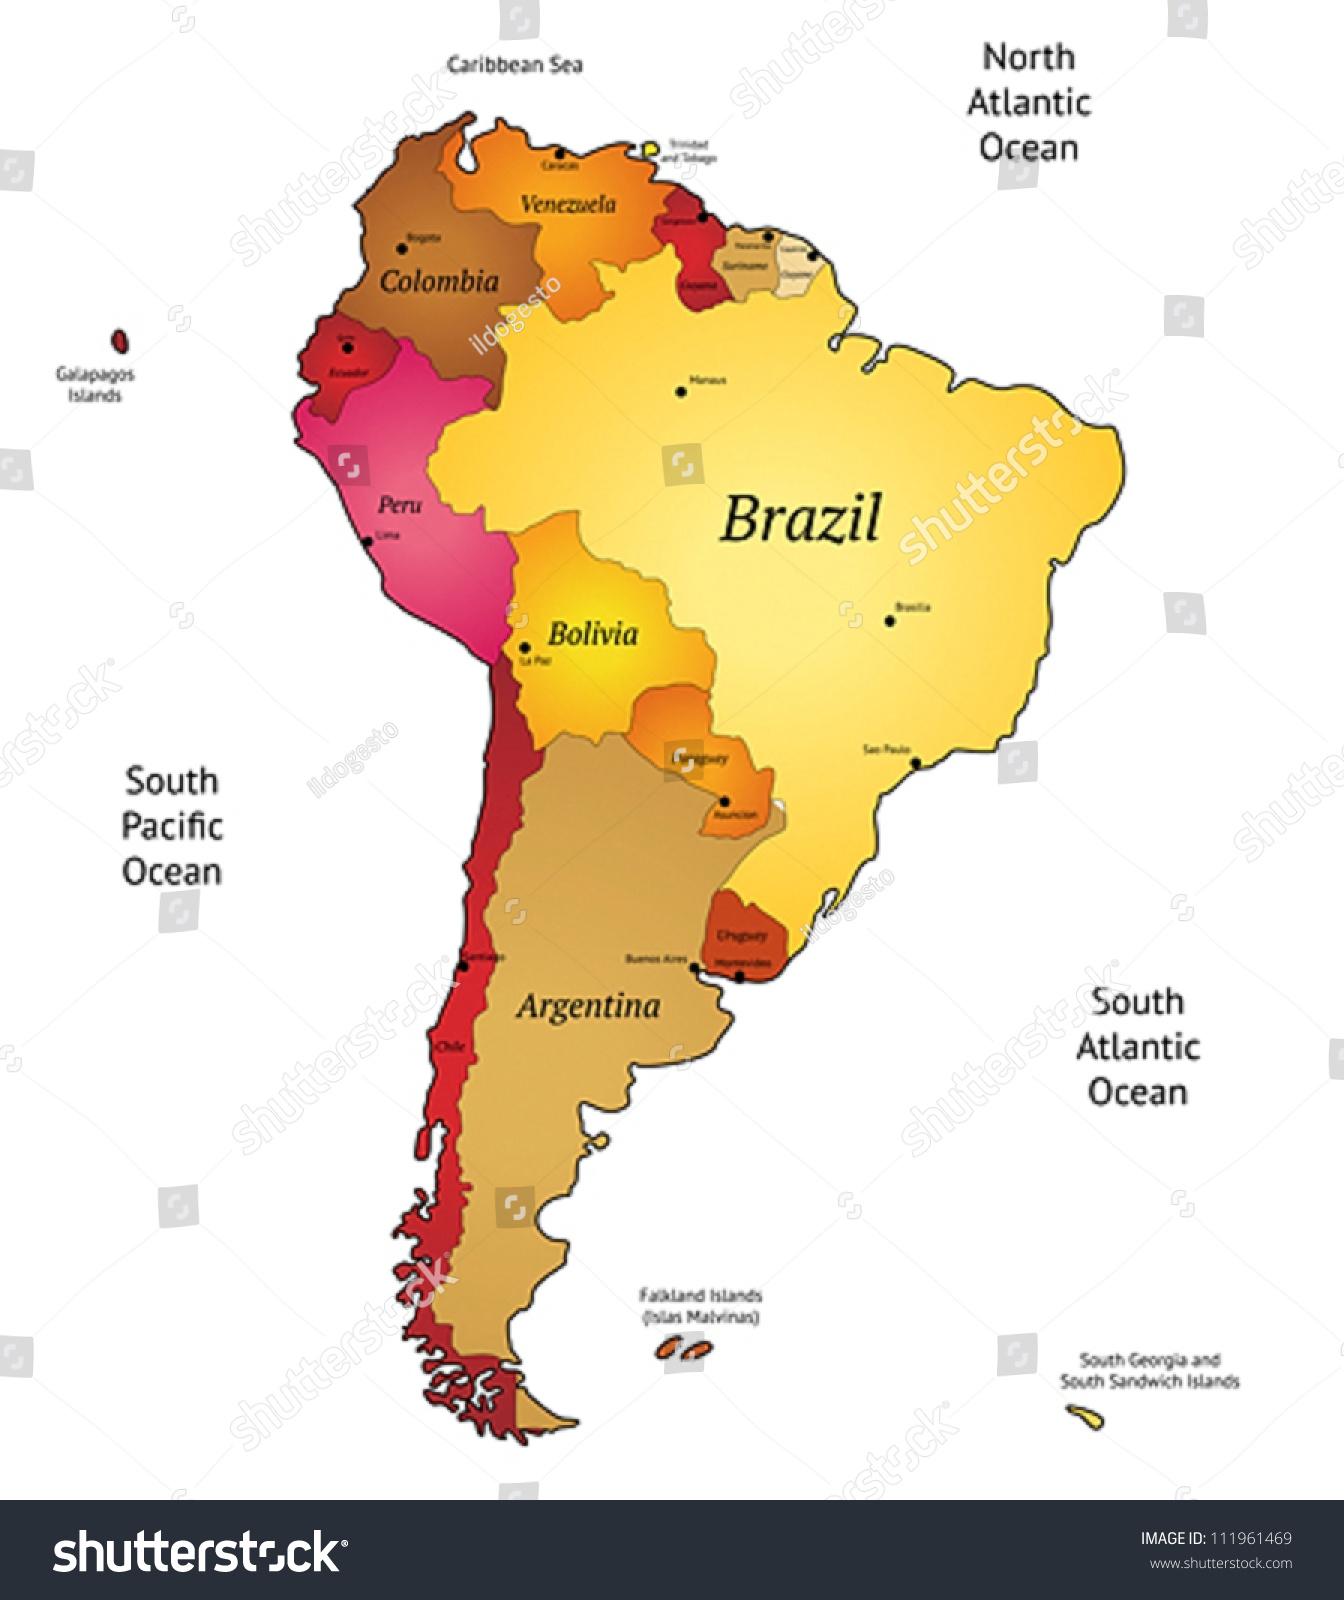 Map Latin America Vector Illustration Stock Vector - Map of the latin america